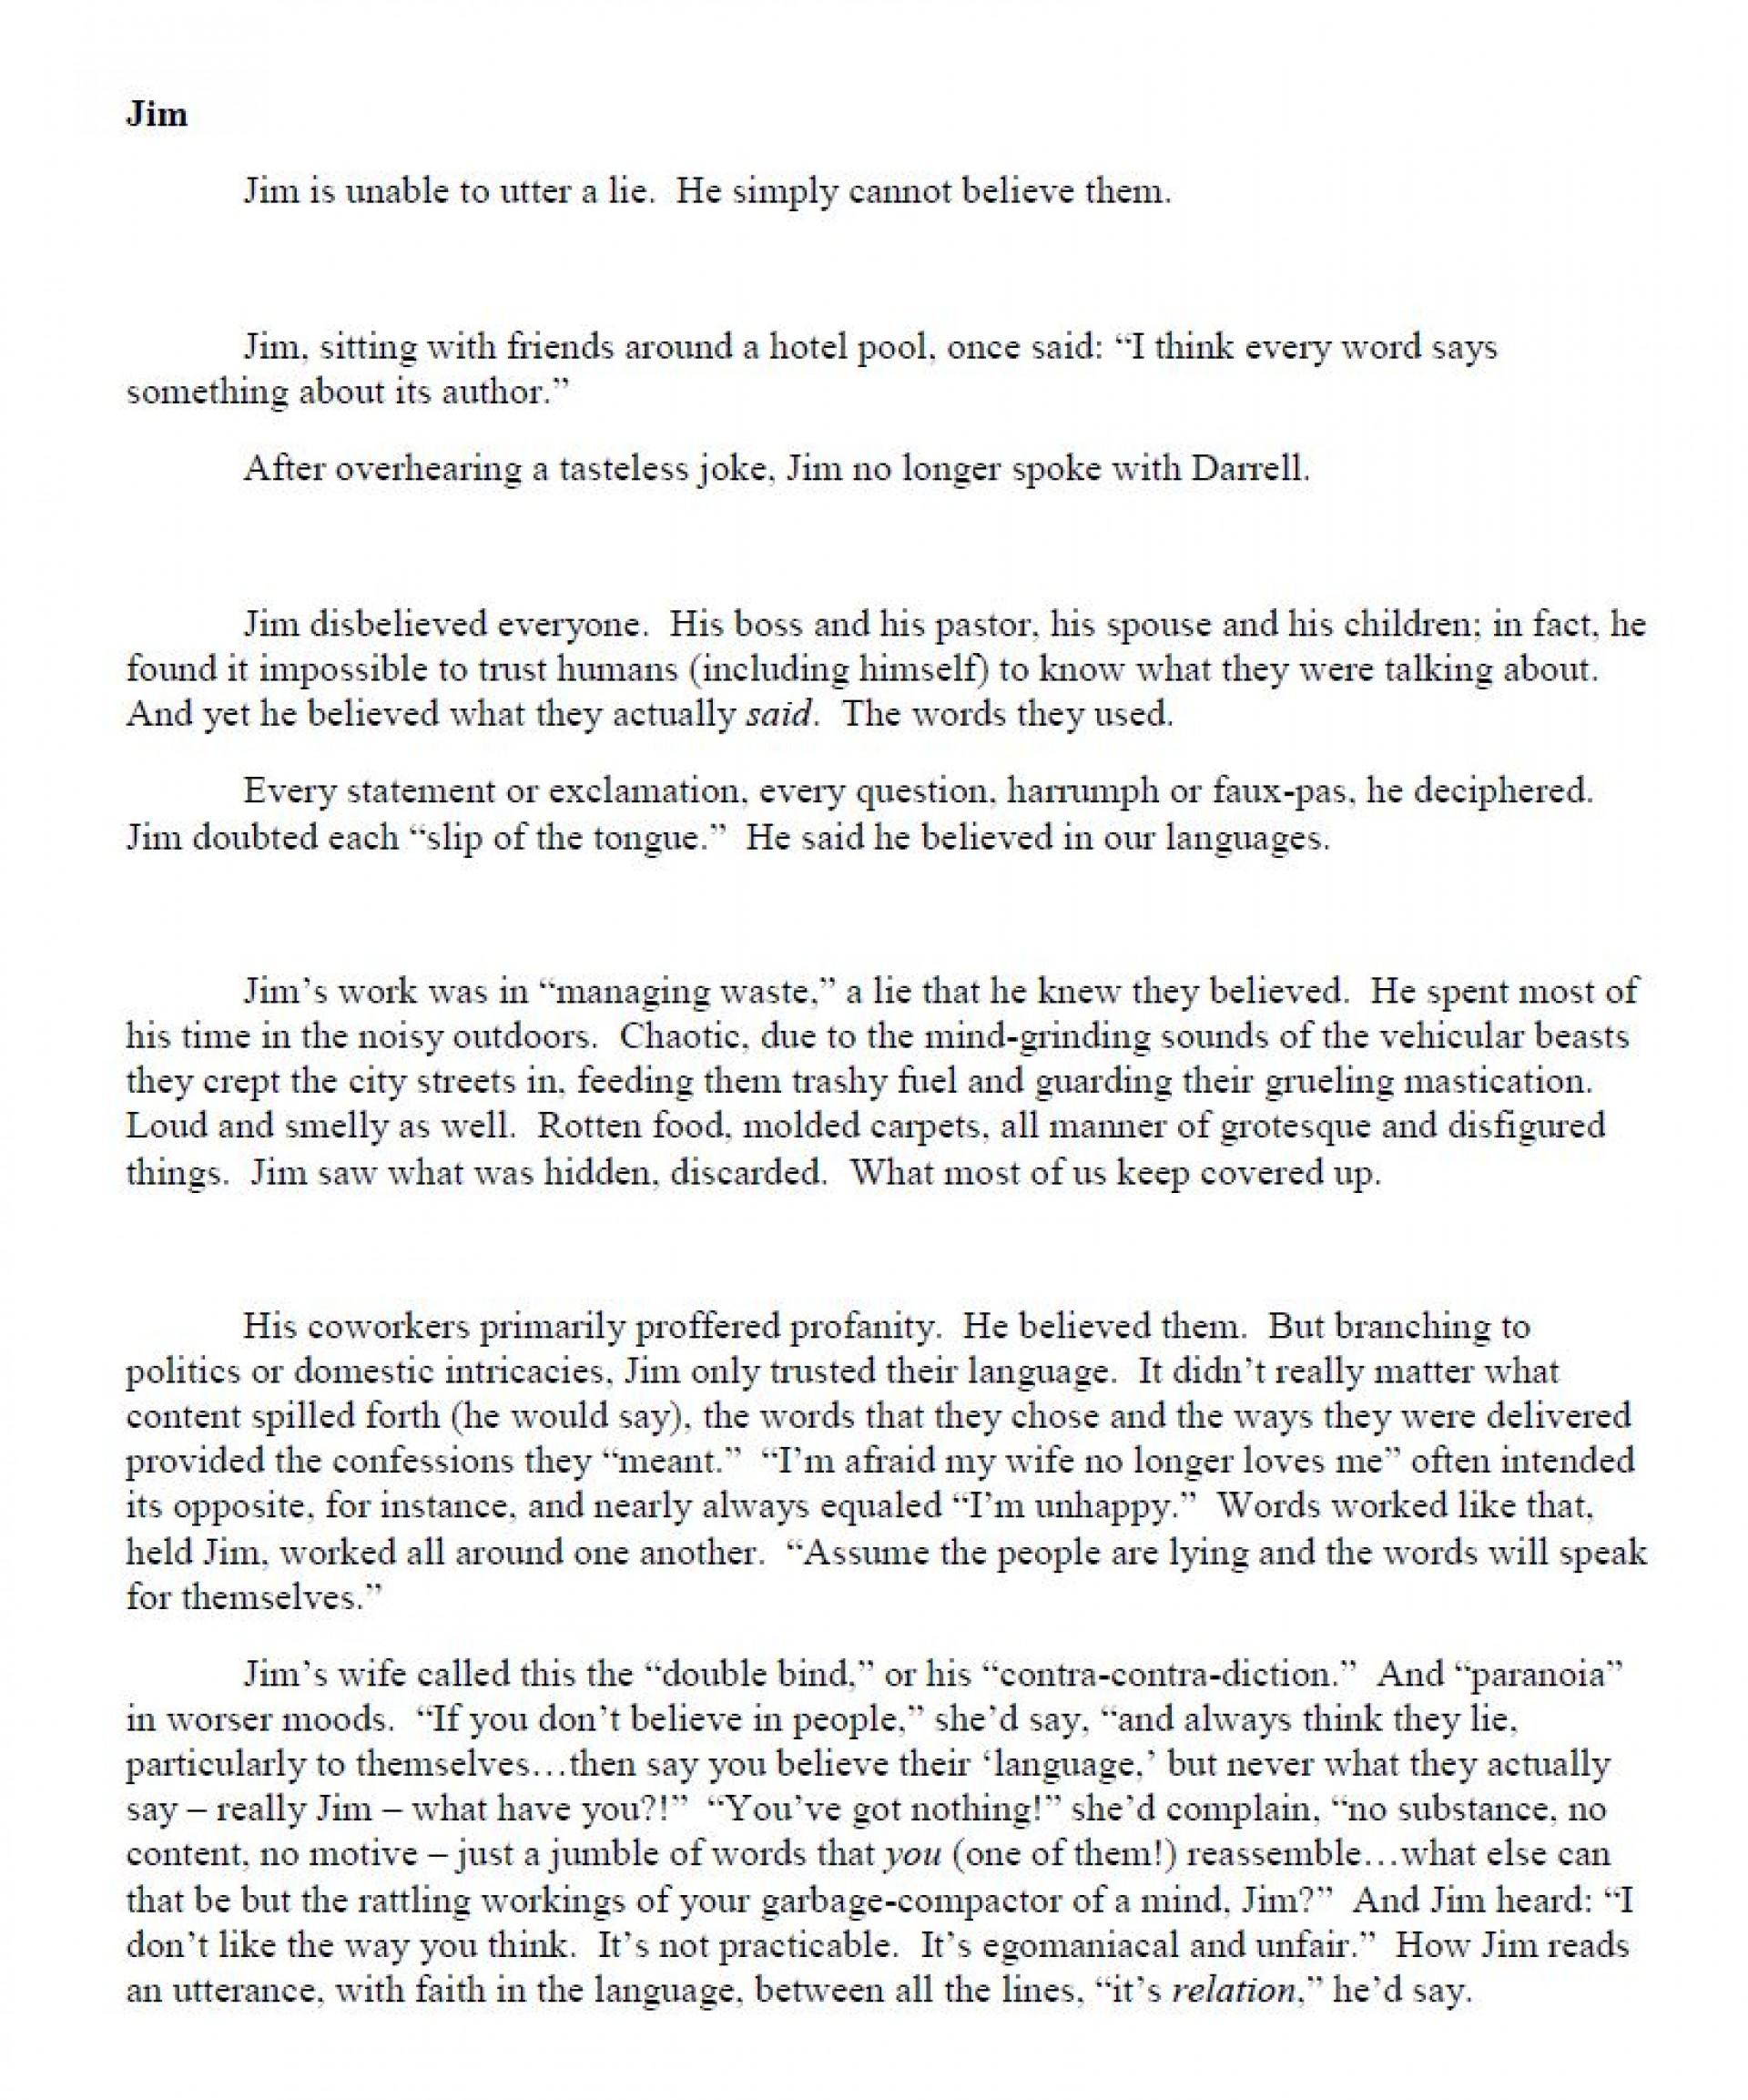 Early Childhood Education Essay - Free Sample Essay for Undergraduates